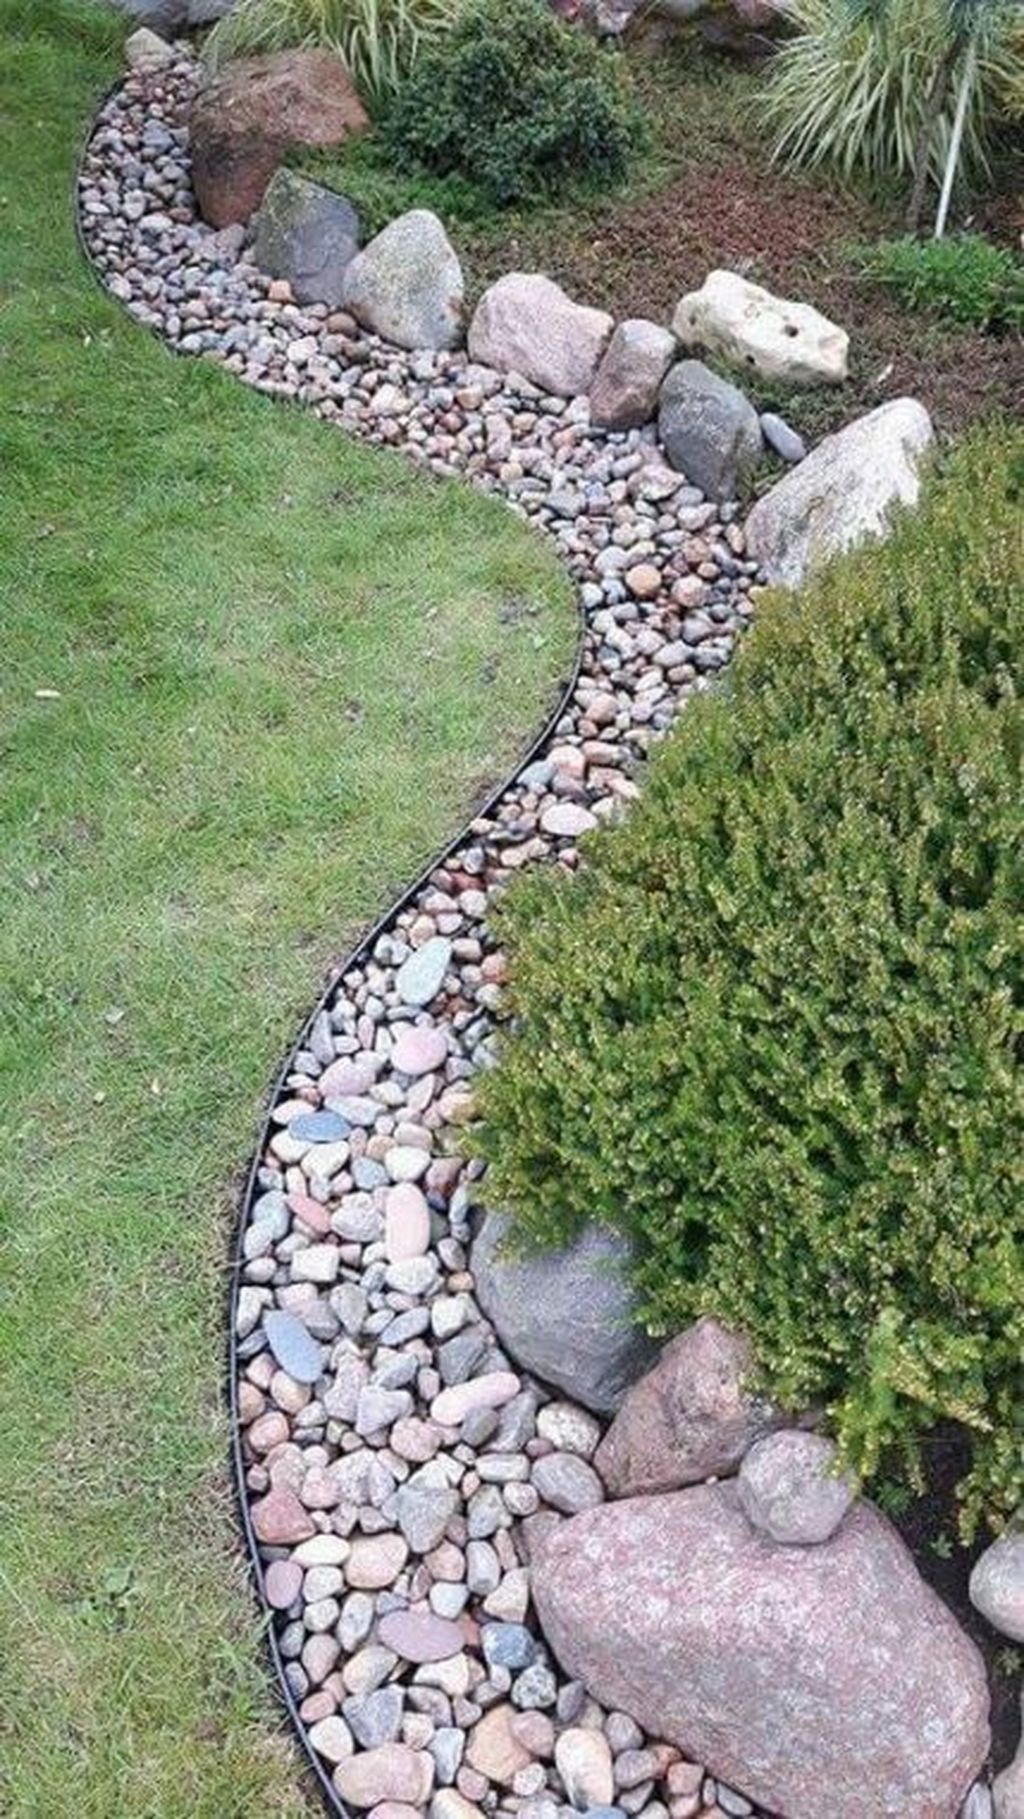 20 Marvelous Garden Border Ideas To Dress Up Your Landscape Edging Front Yard Landscaping Design Rock Garden Landscaping Landscaping With Rocks Backyard border landscaping ideas